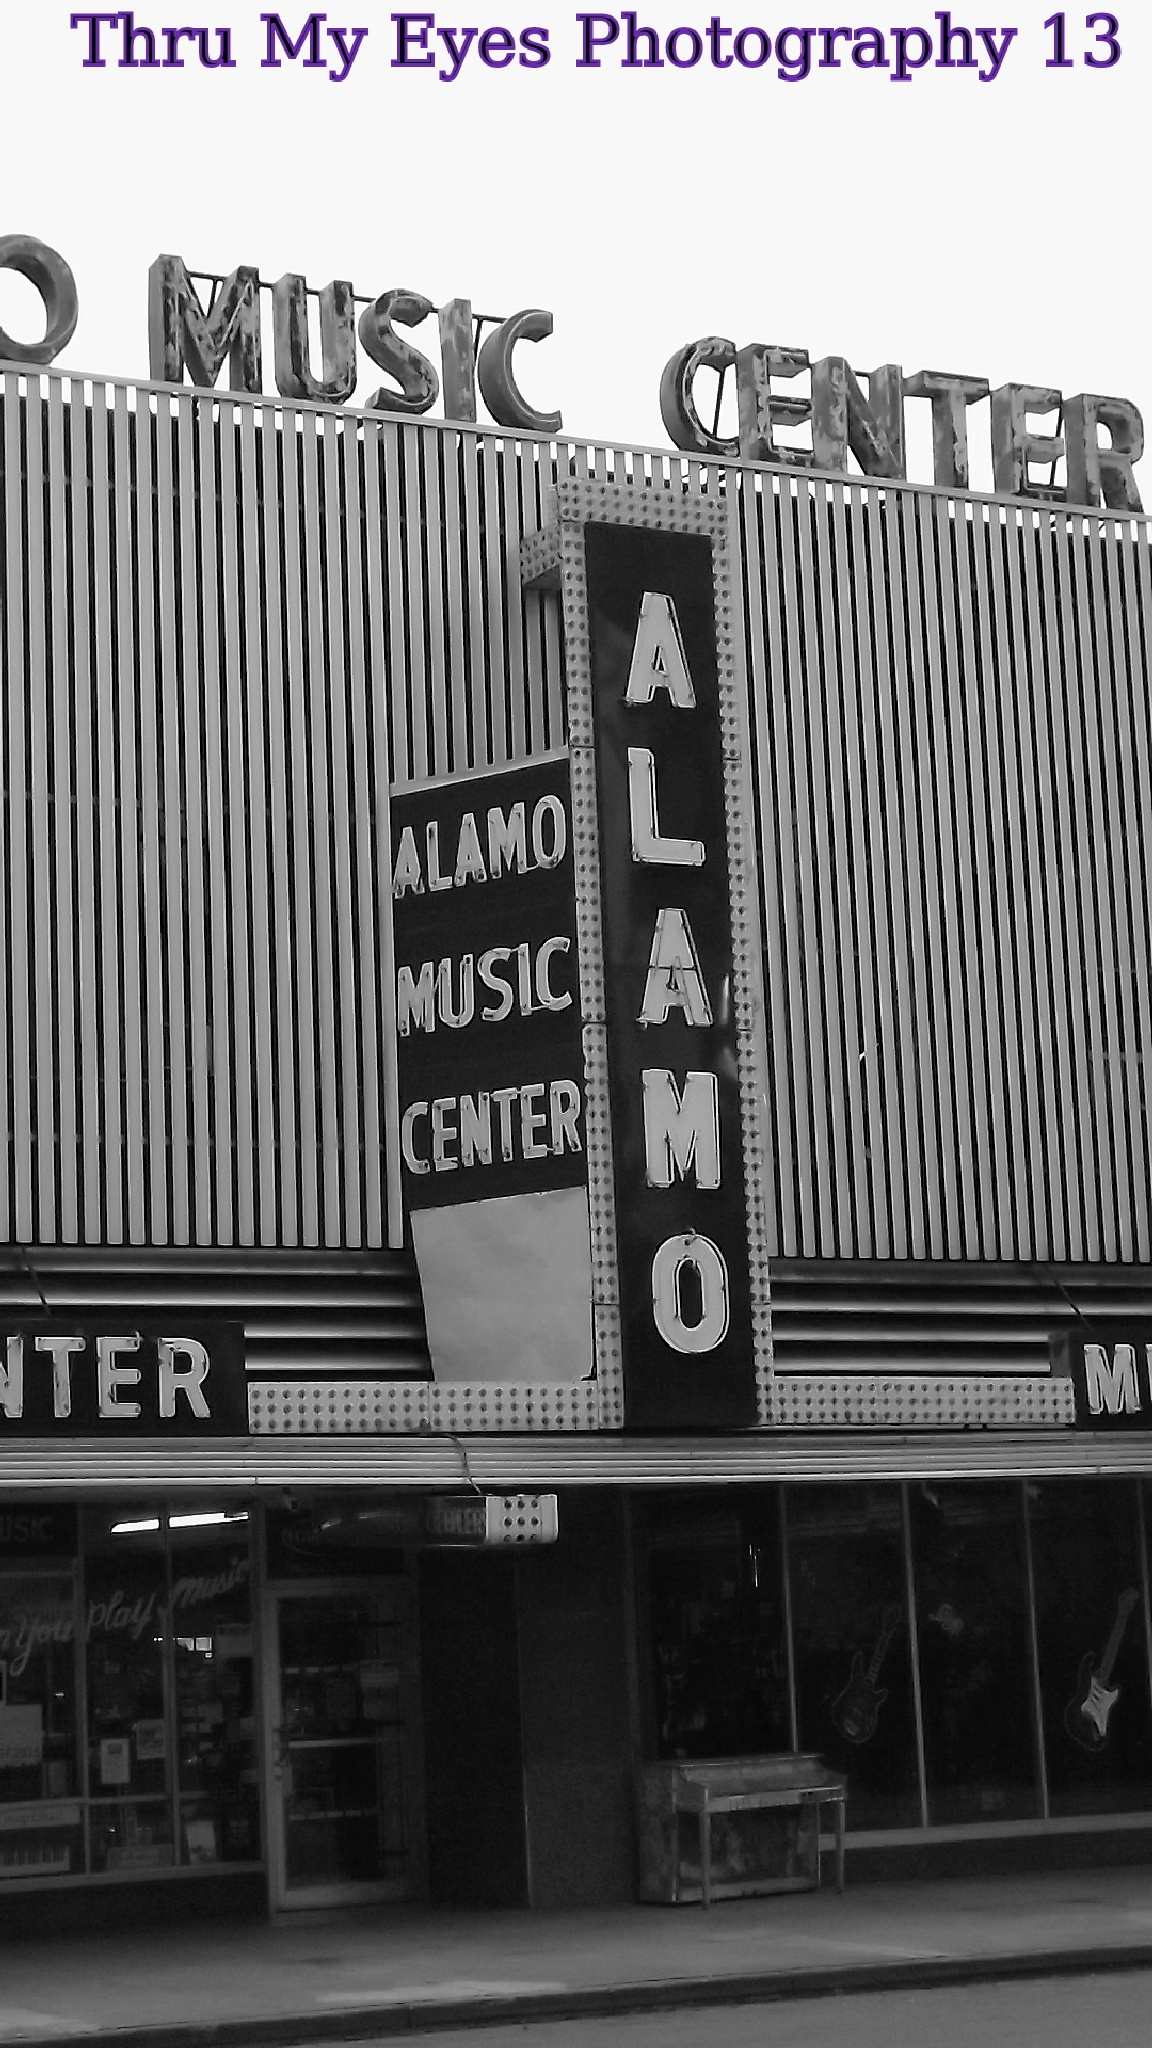 The Alamo Music Center by captain